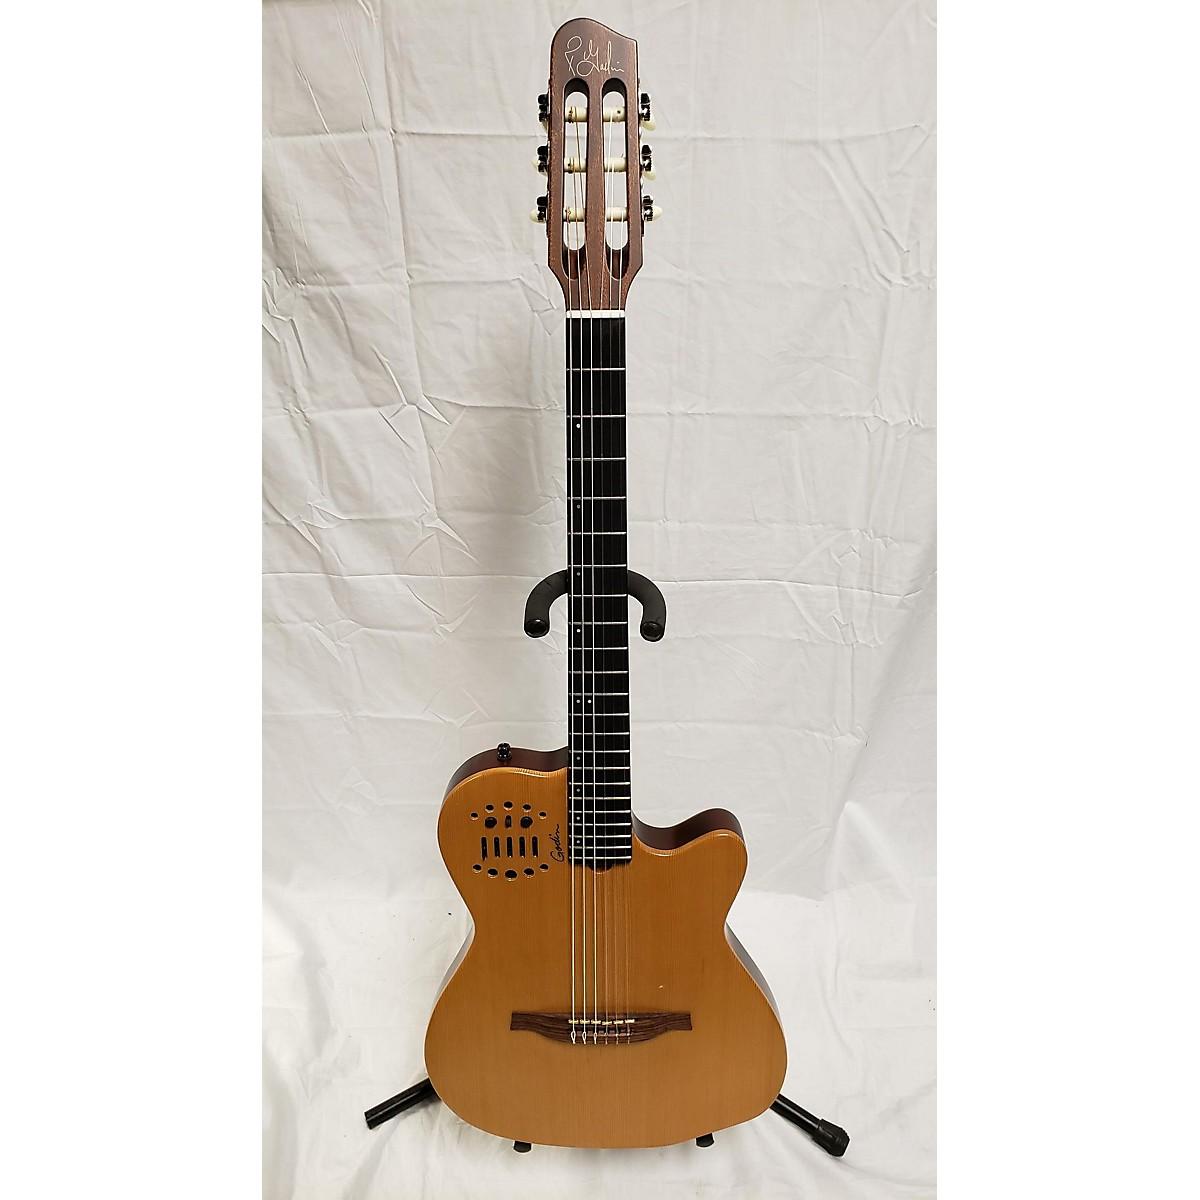 Godin ACS Slim SA Solid Body Electric Guitar